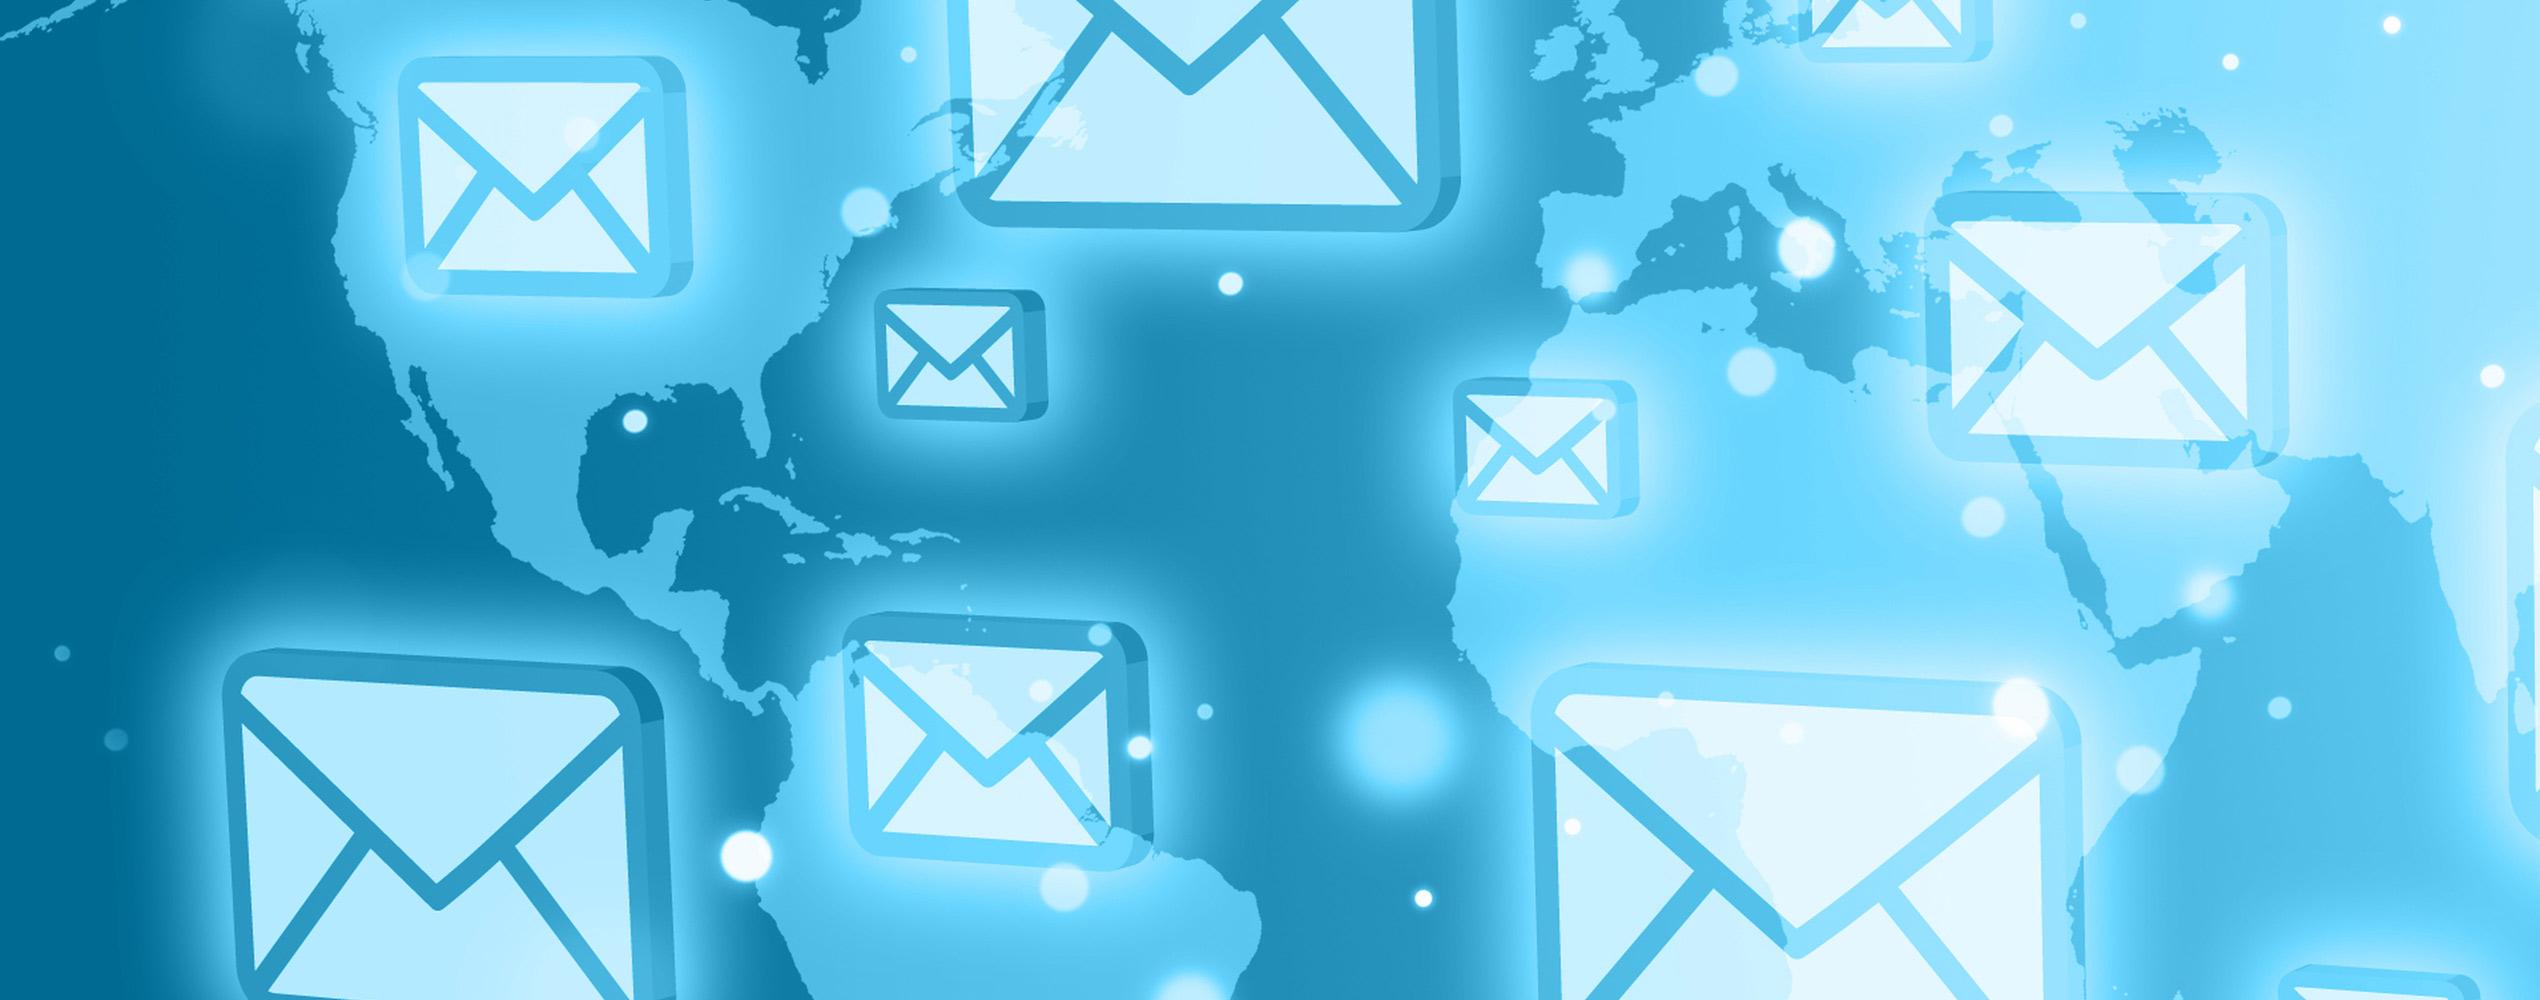 Digital Mail - shutterstock 170052380